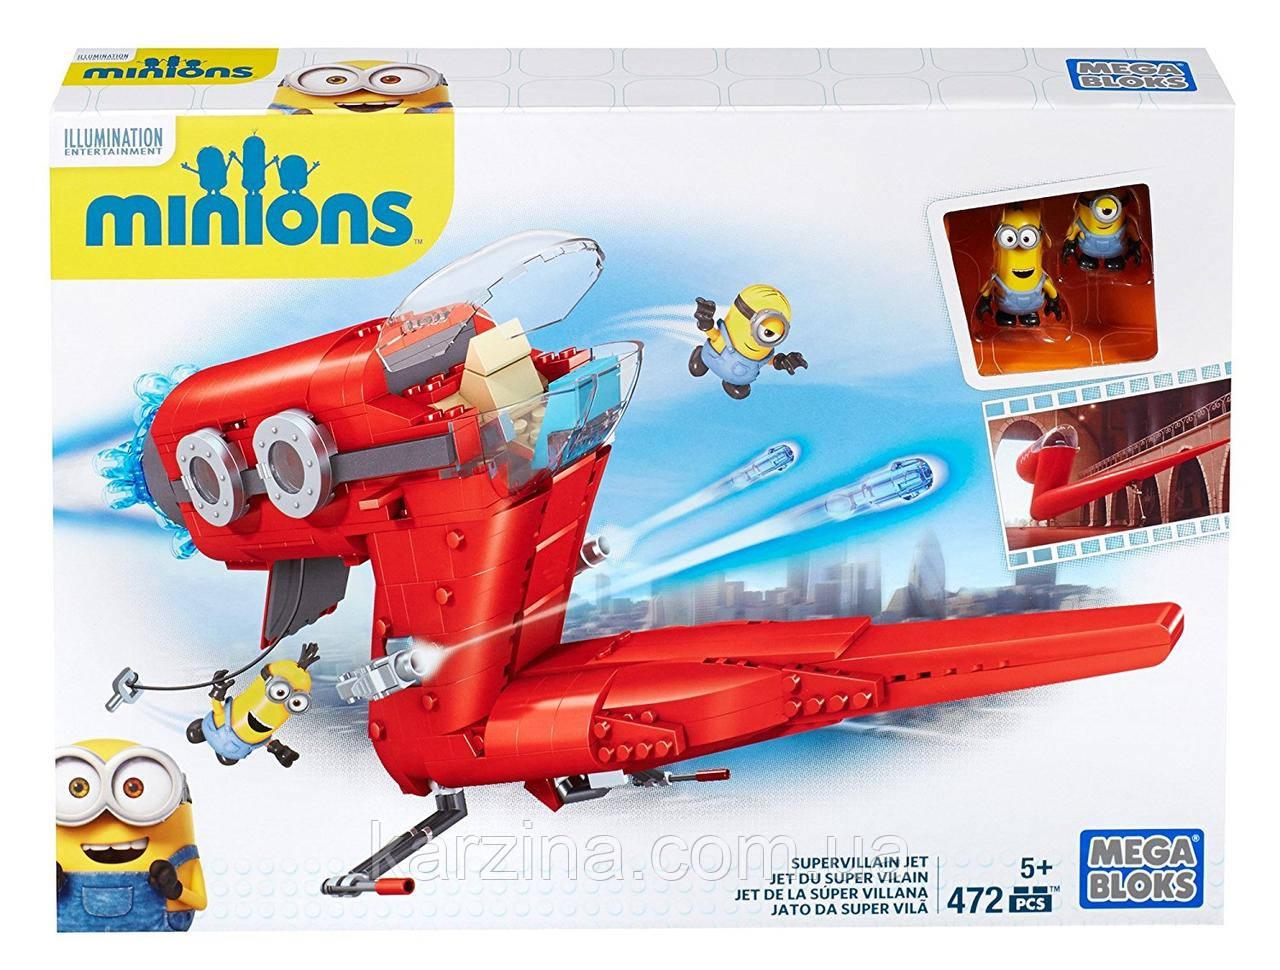 Конструктор Mega Bloks Minions Supervillain Jet